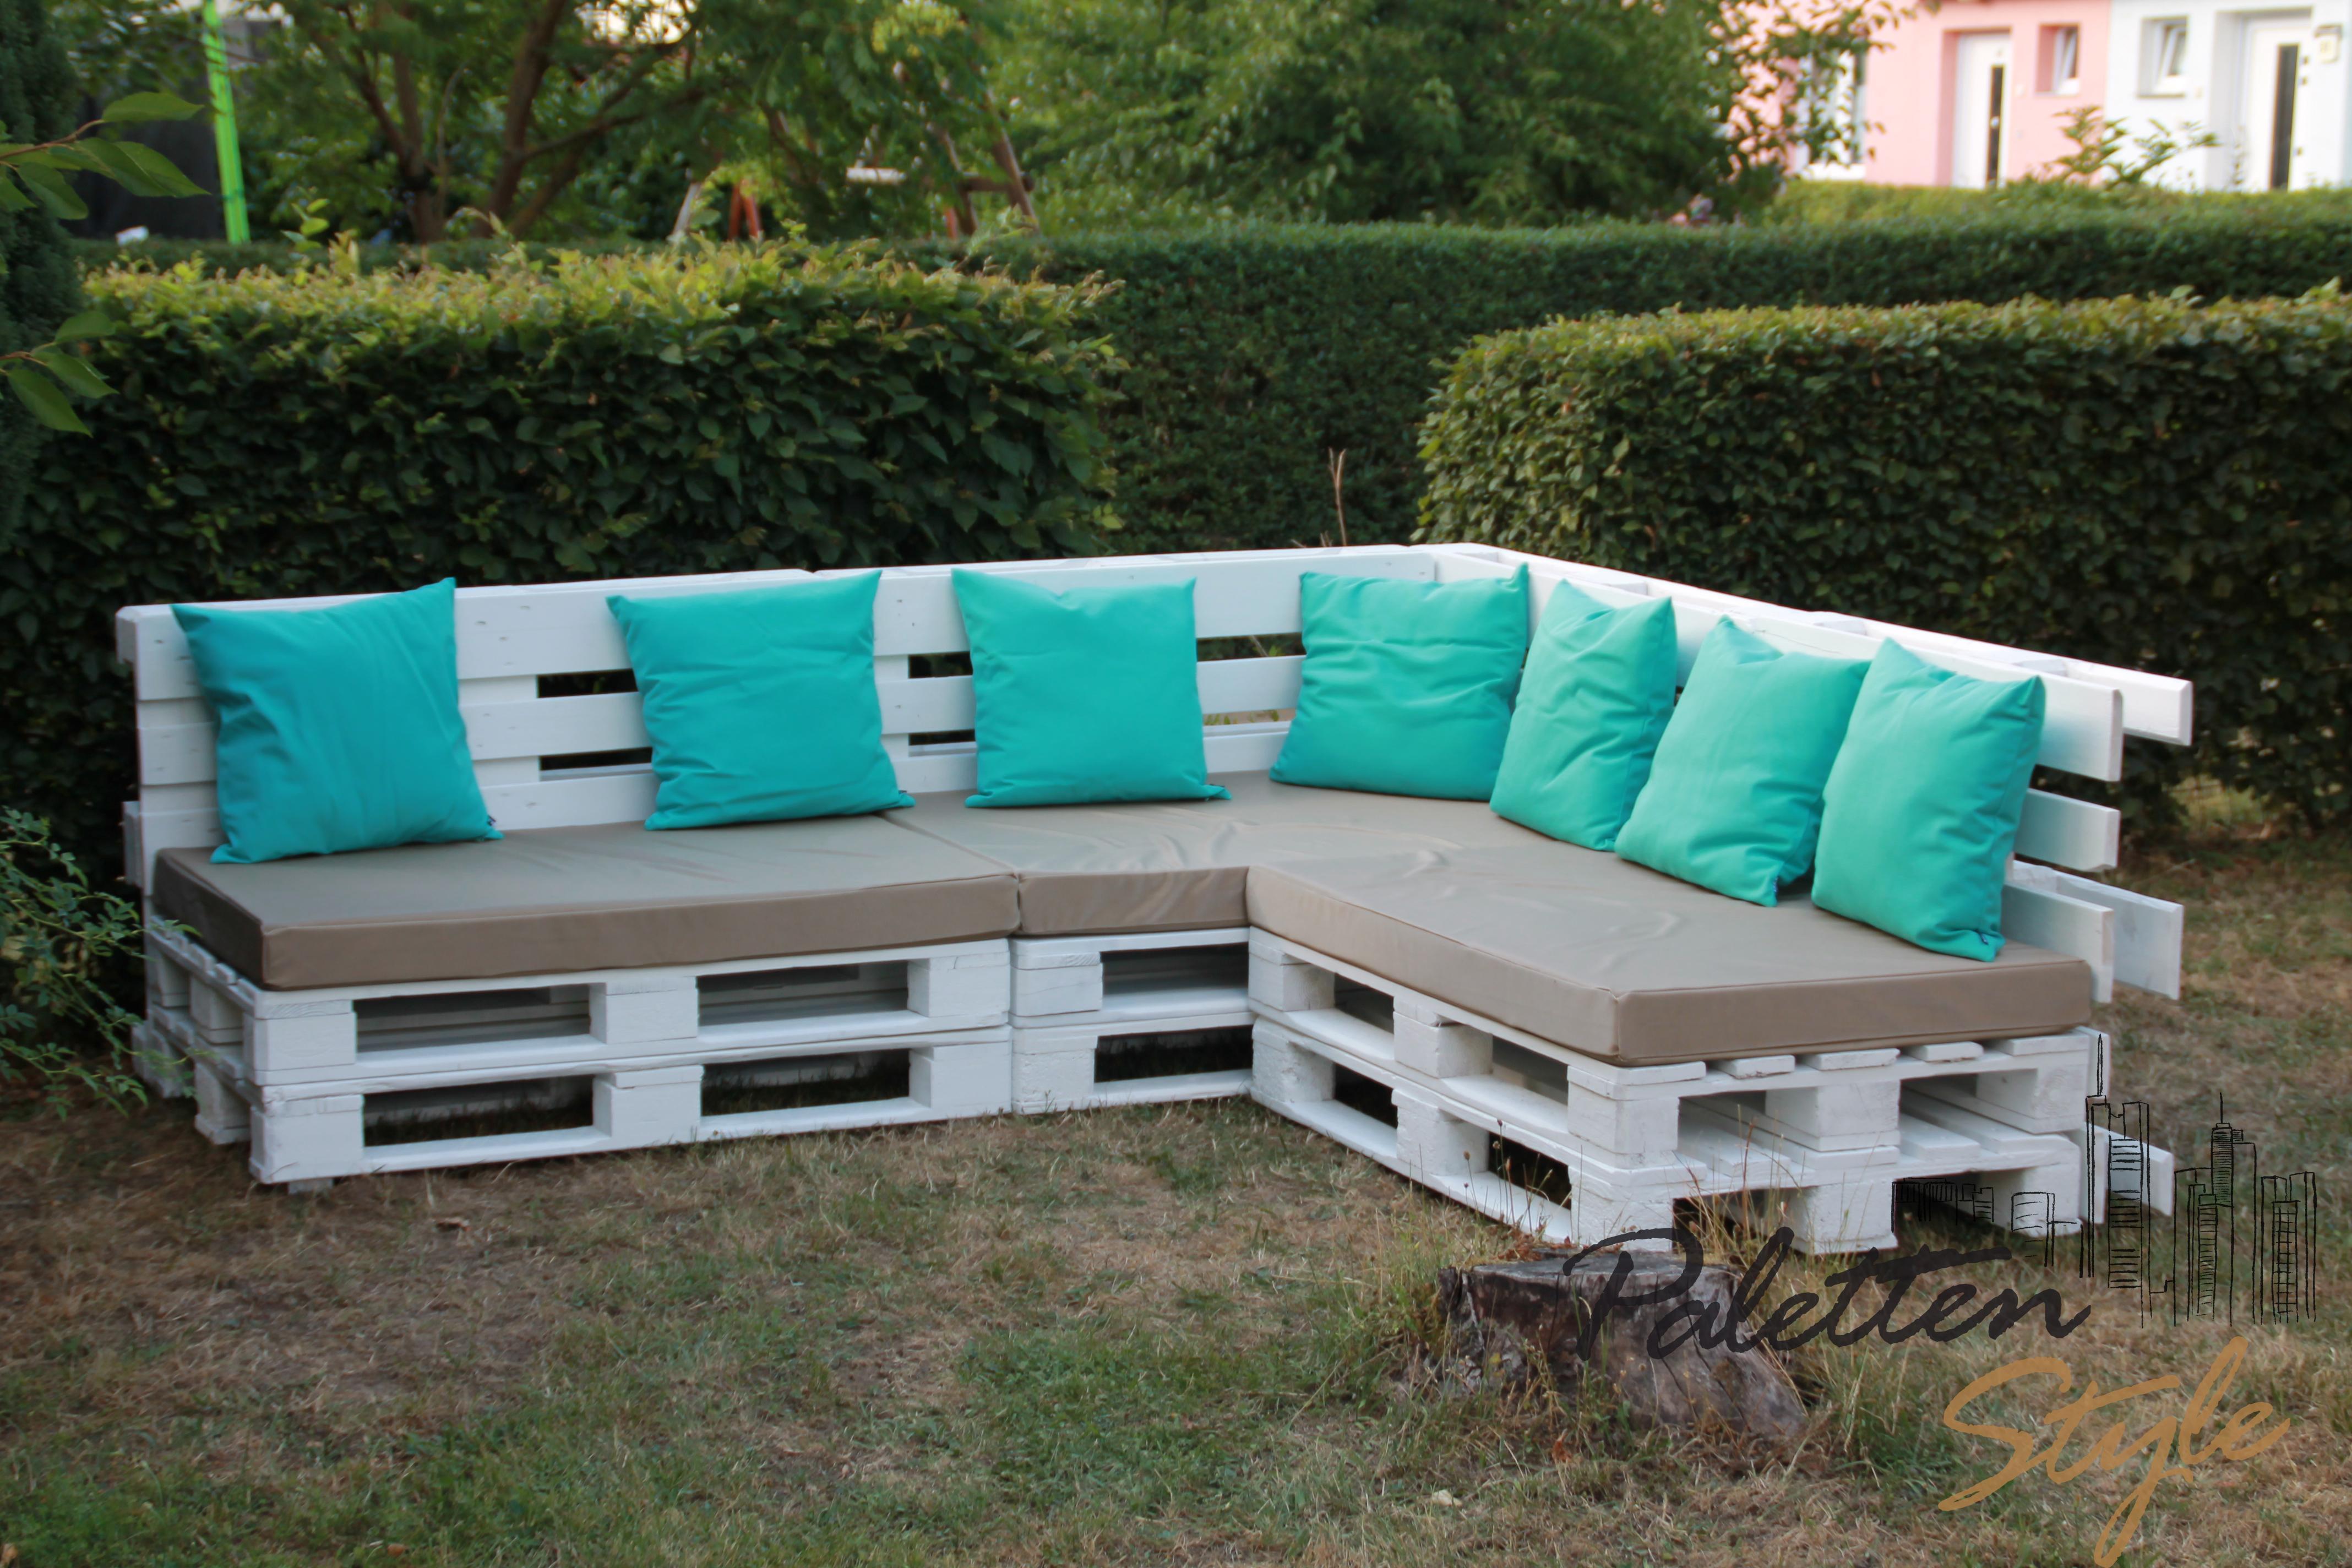 Idea diy perabot pallet untuk laman rumah dengan sofa pallet putih siap kusyen